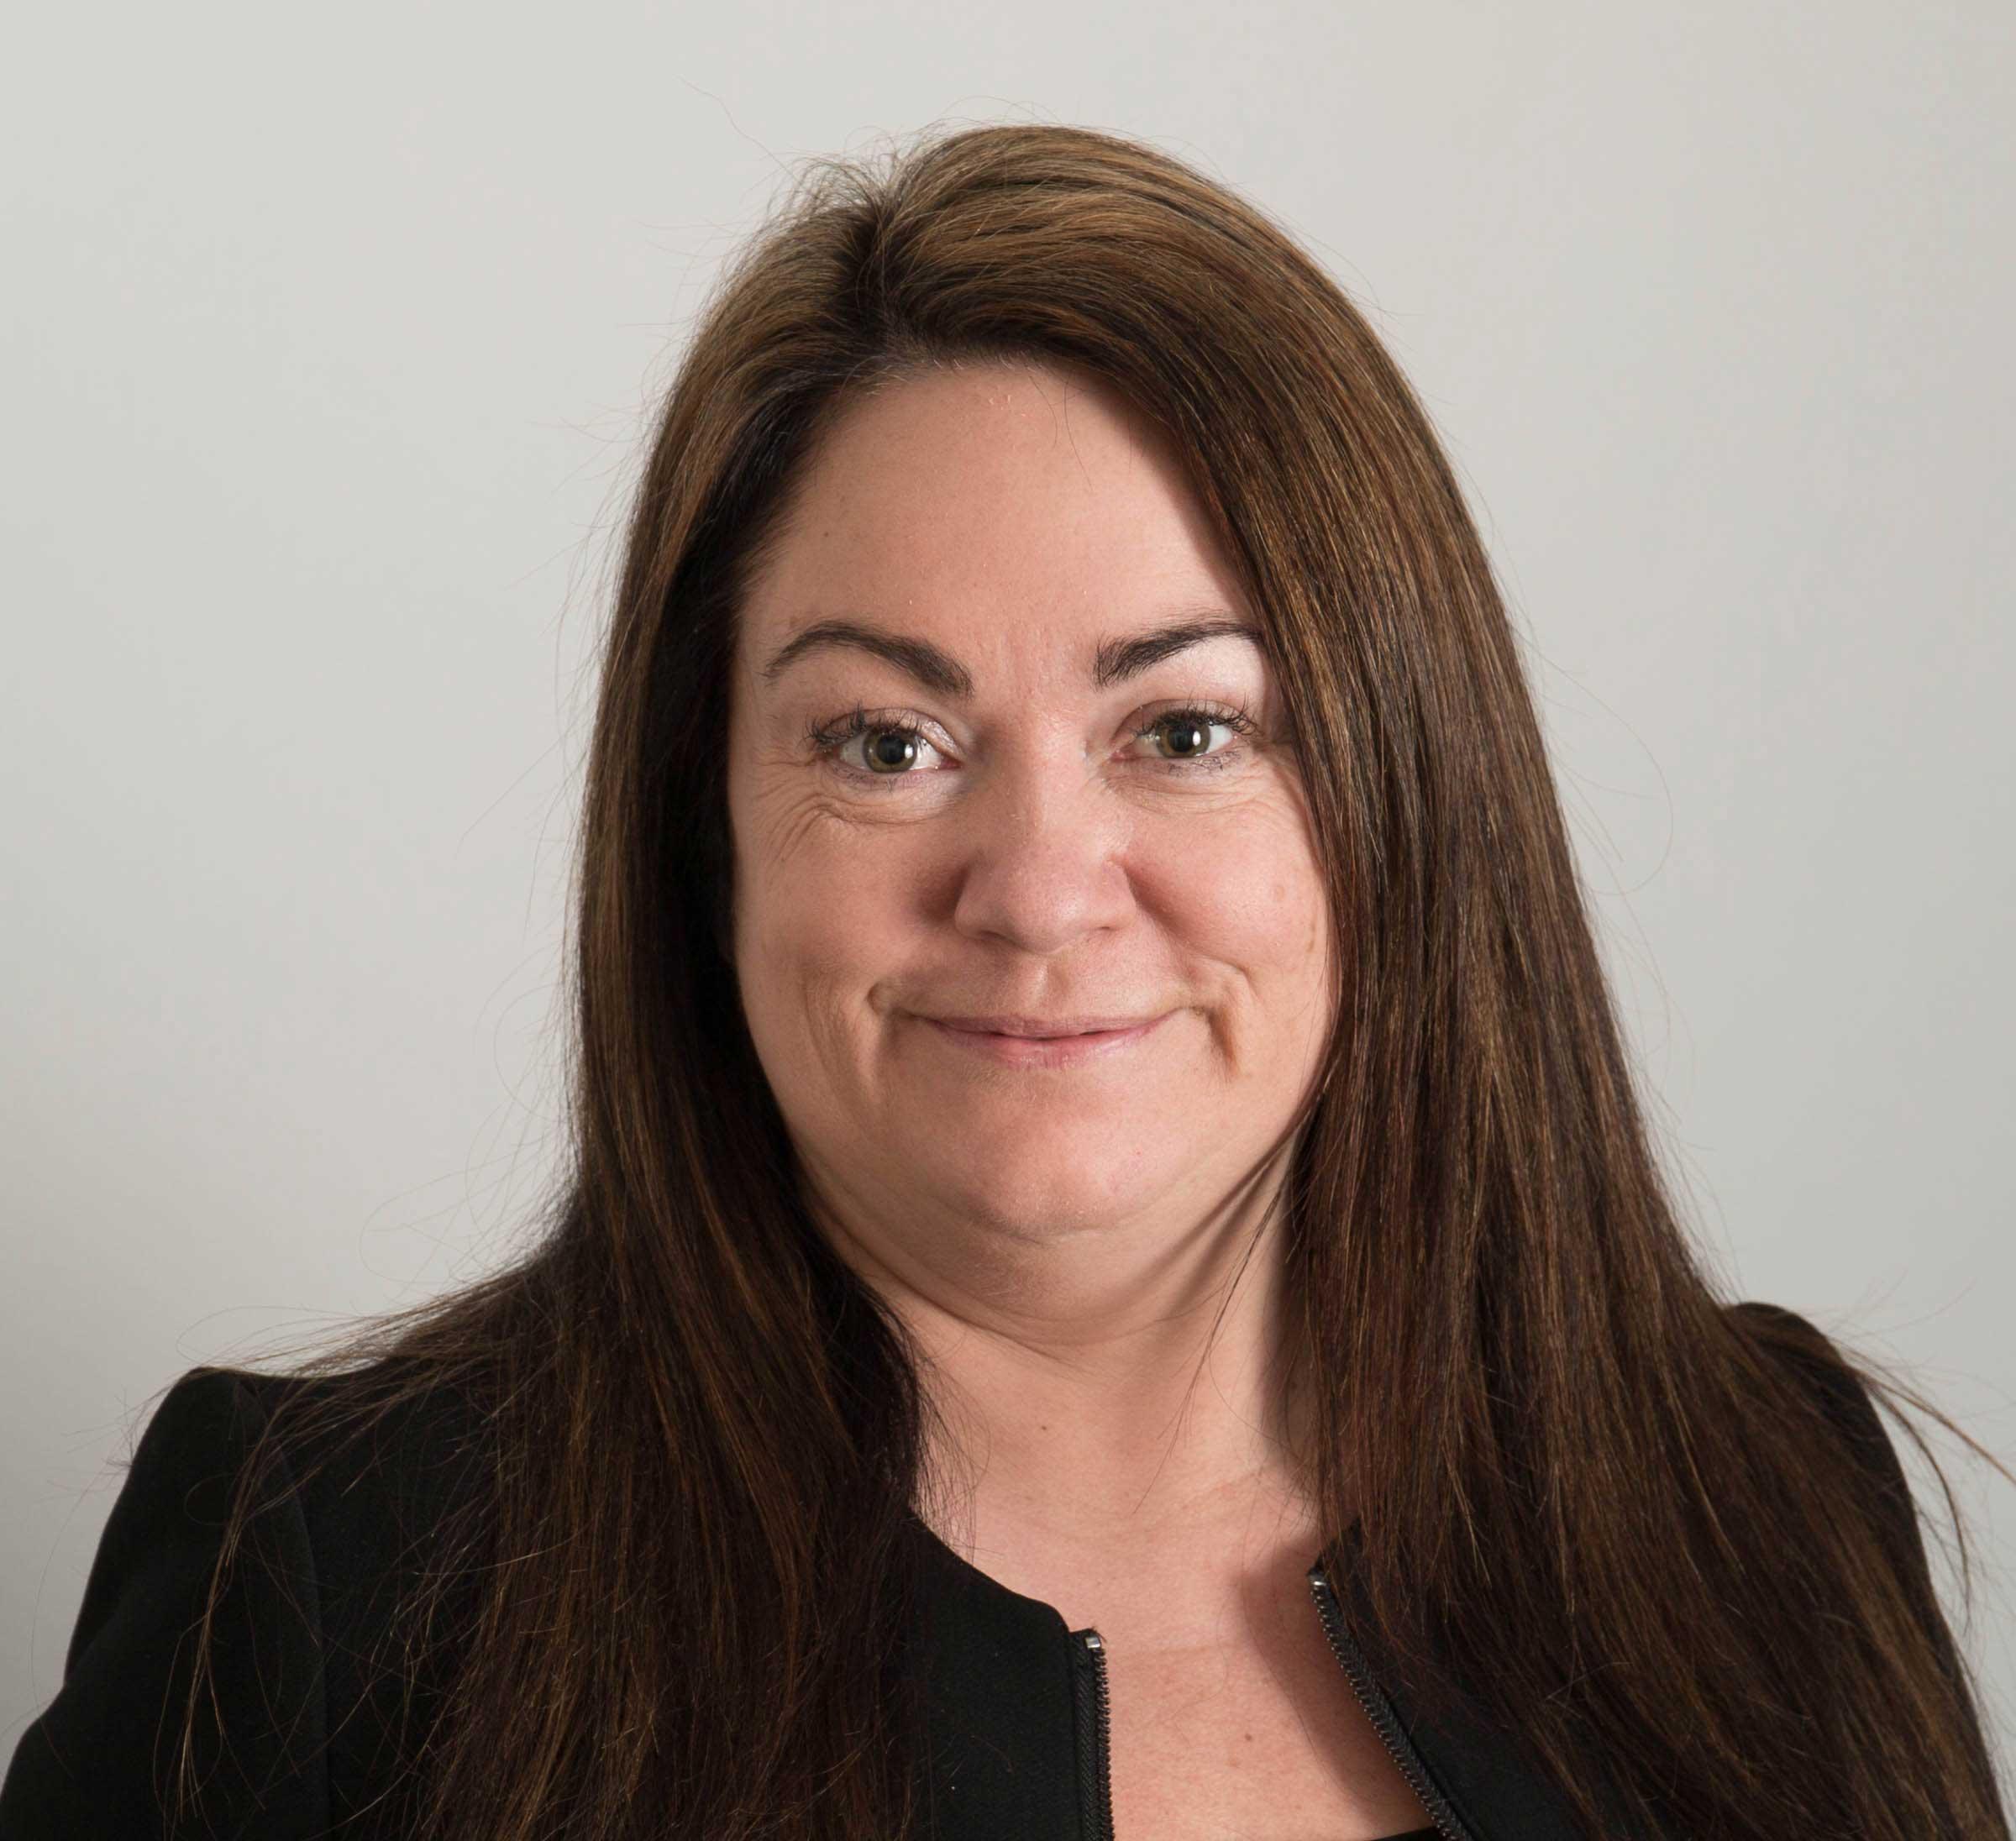 Debbie Brandon-Sweeney joins SG World Board of Directors